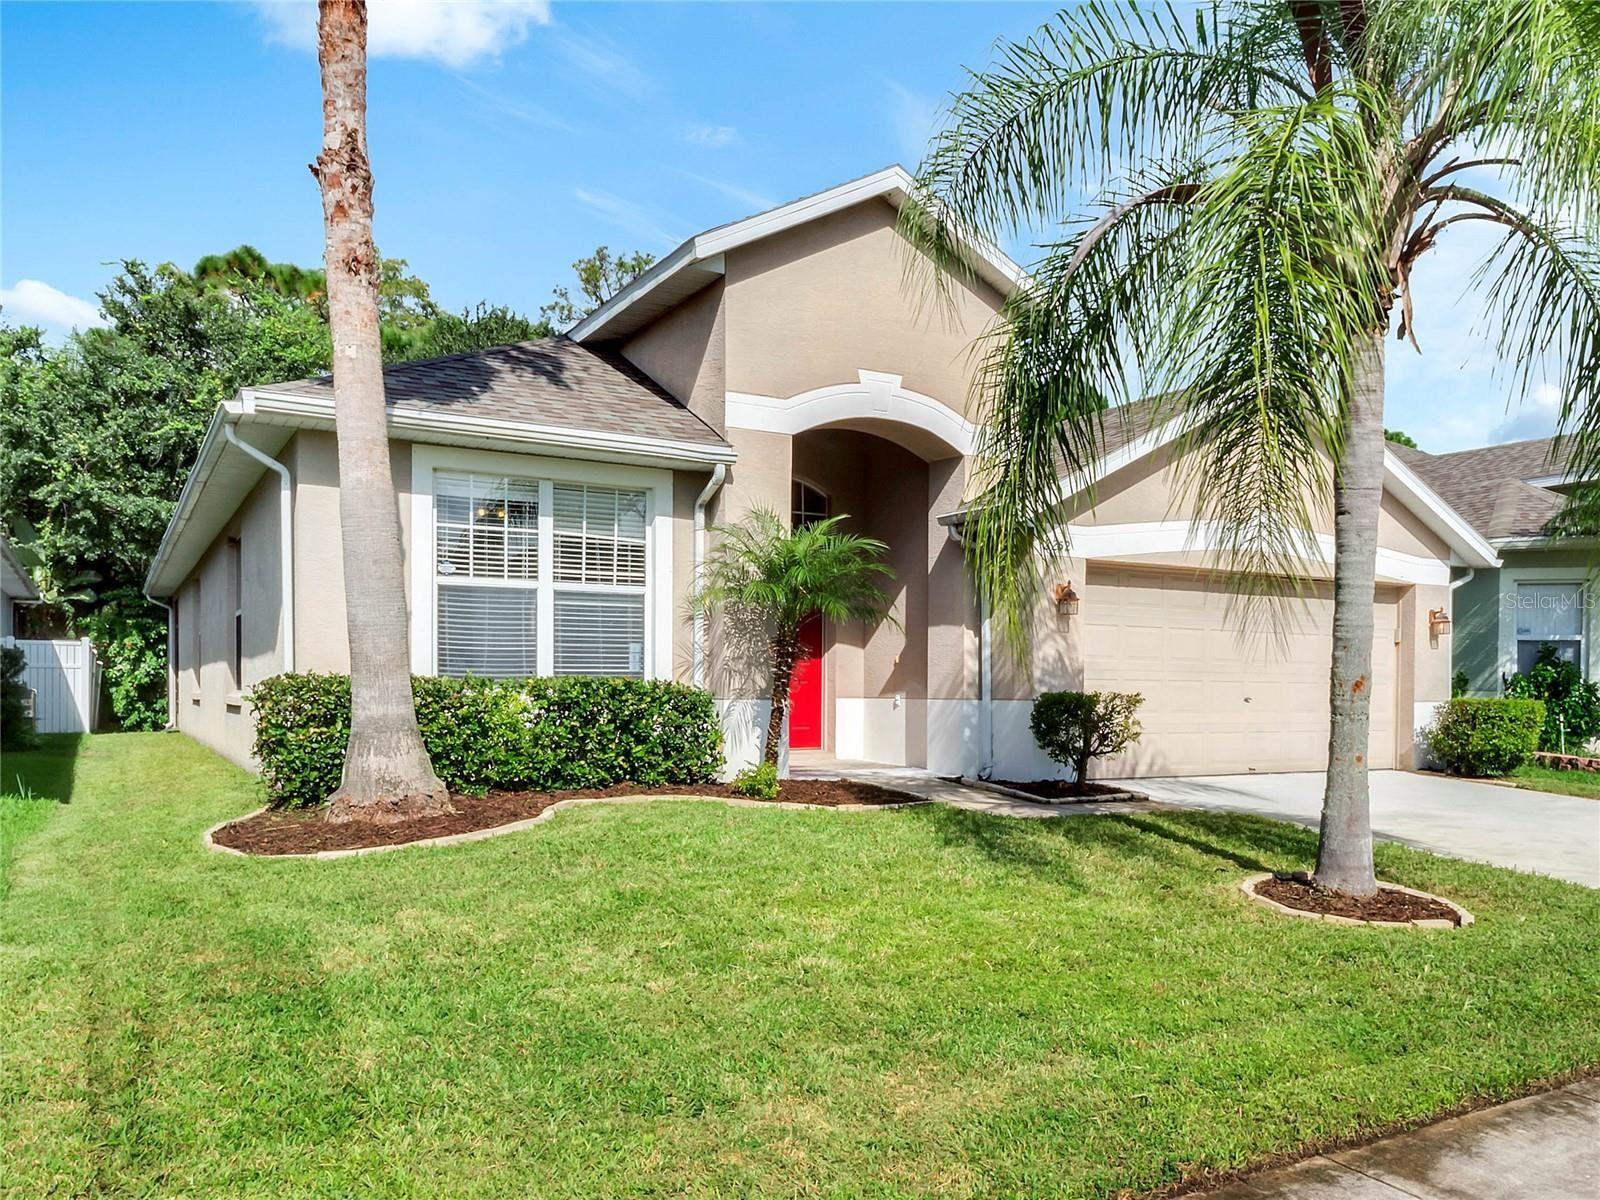 2252 CYPRESS TRACE CIRCLE, Orlando, FL 32825 - #: O5972459